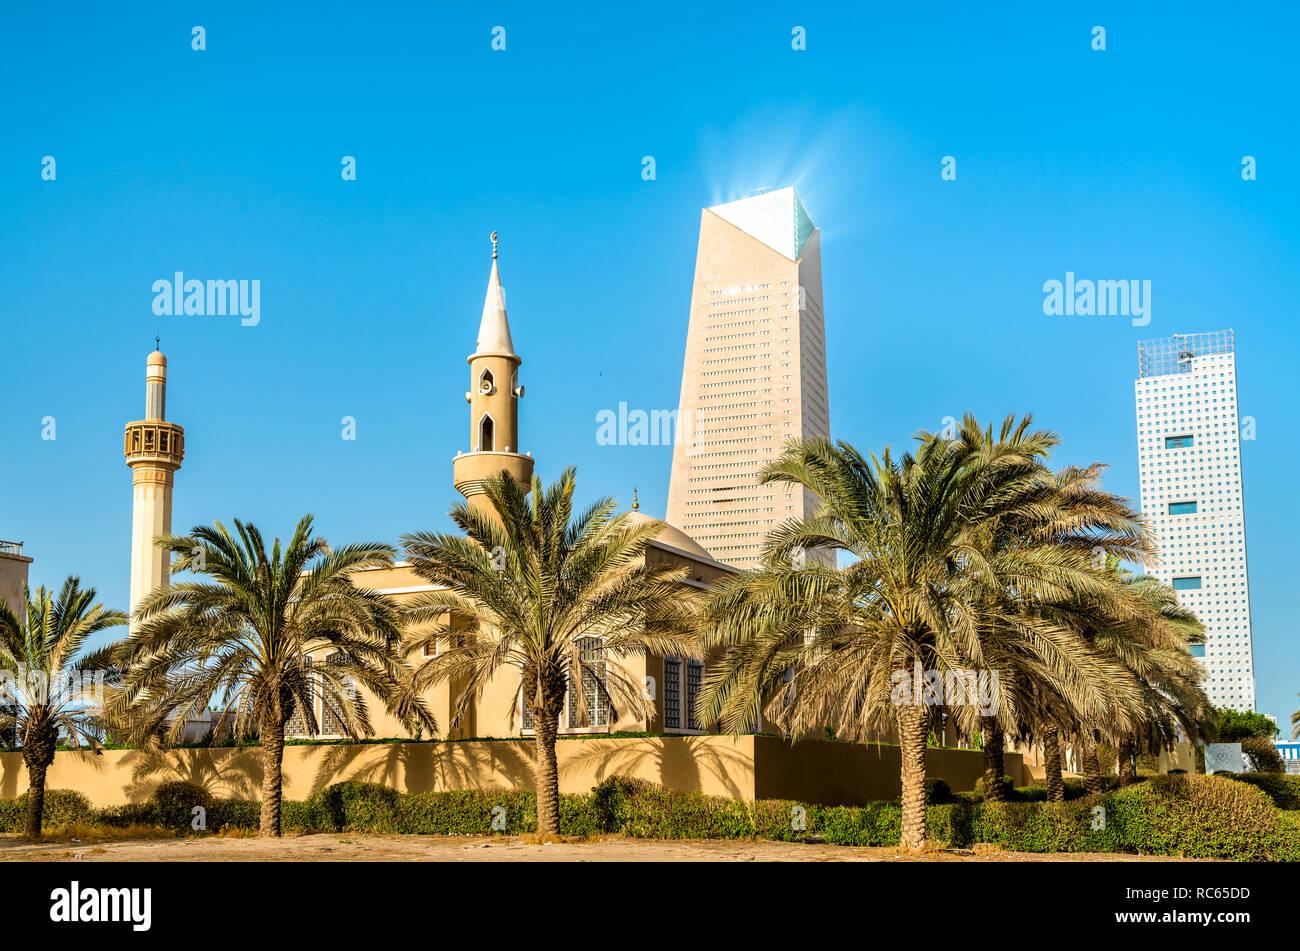 Al Haddad Mosque in Kuwait City - Stock Image